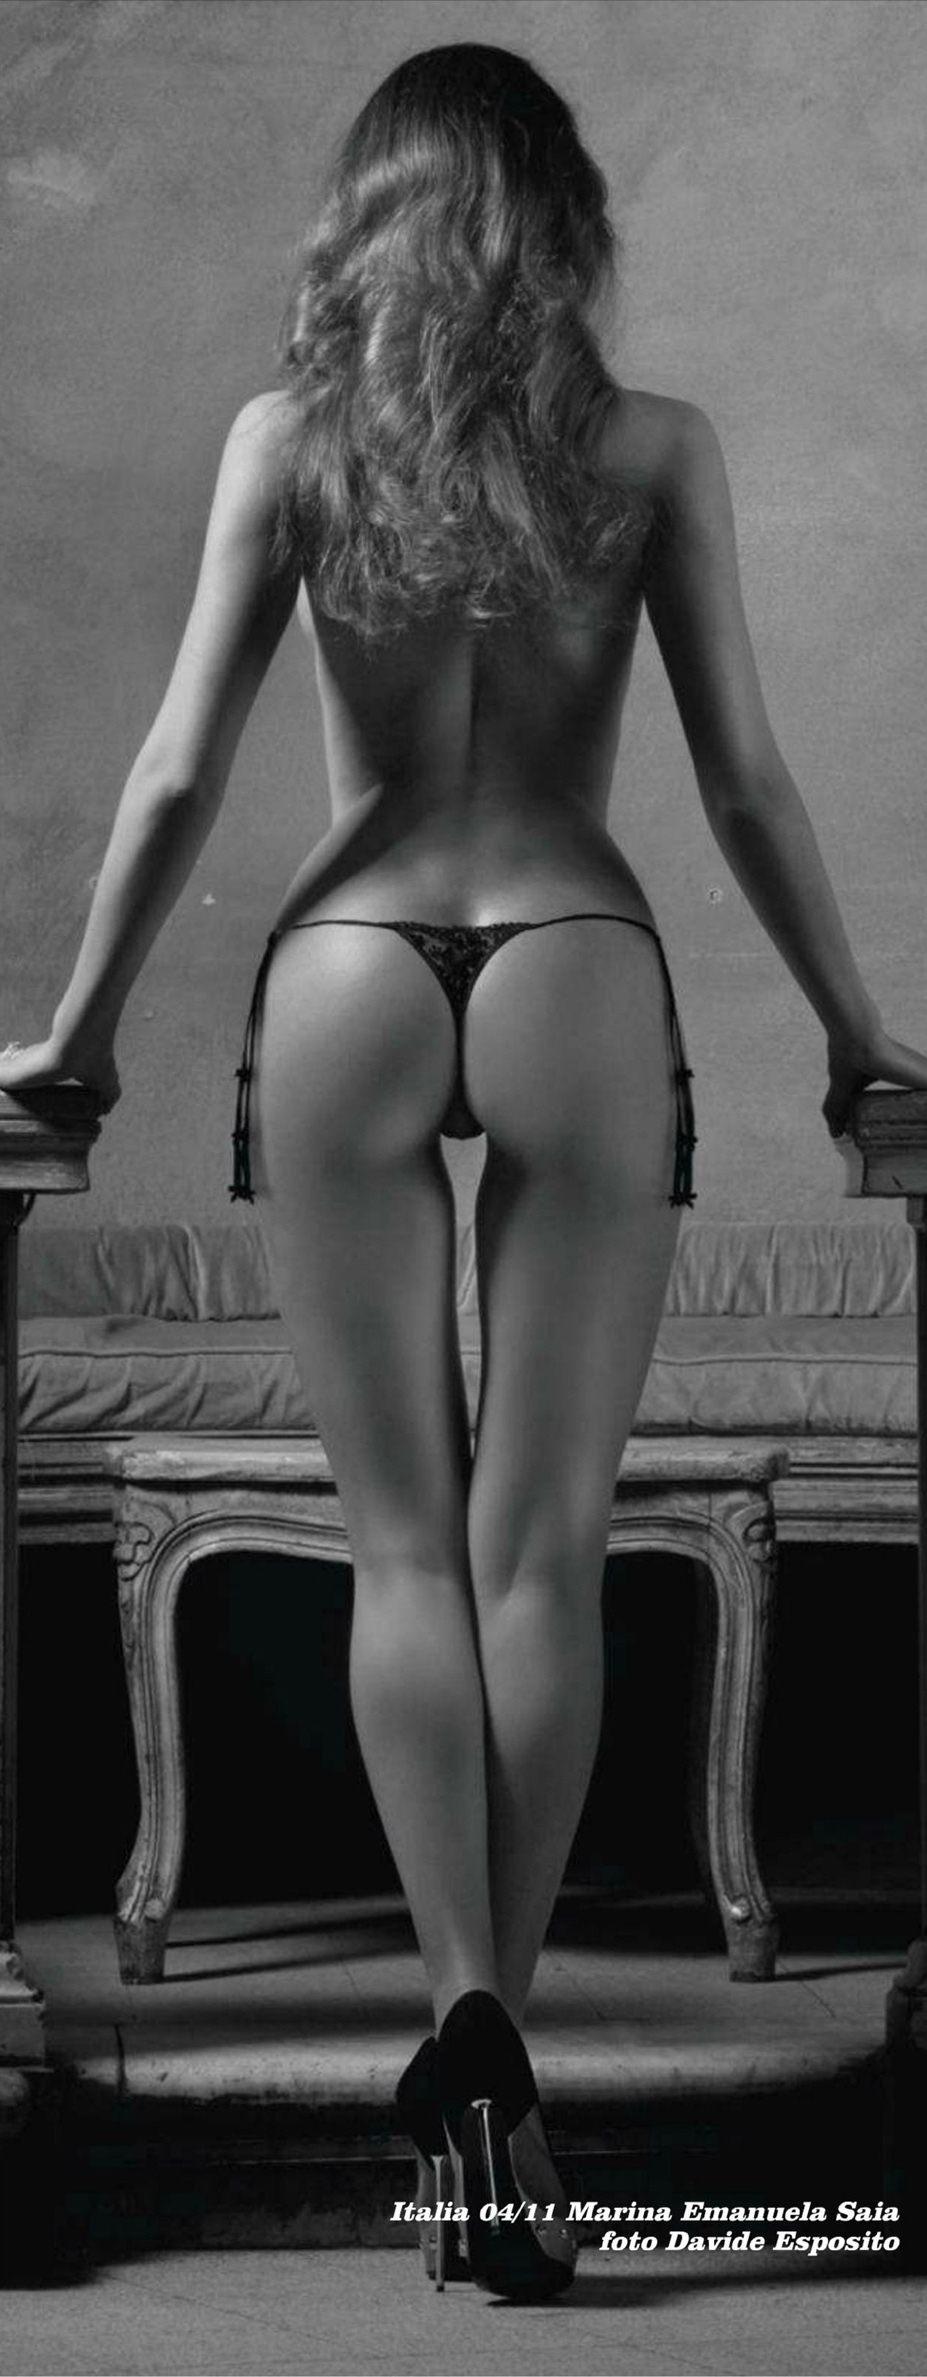 Ass of the World / Rear View - Playboy - самые красивые попы - Marina Emanuela Saia